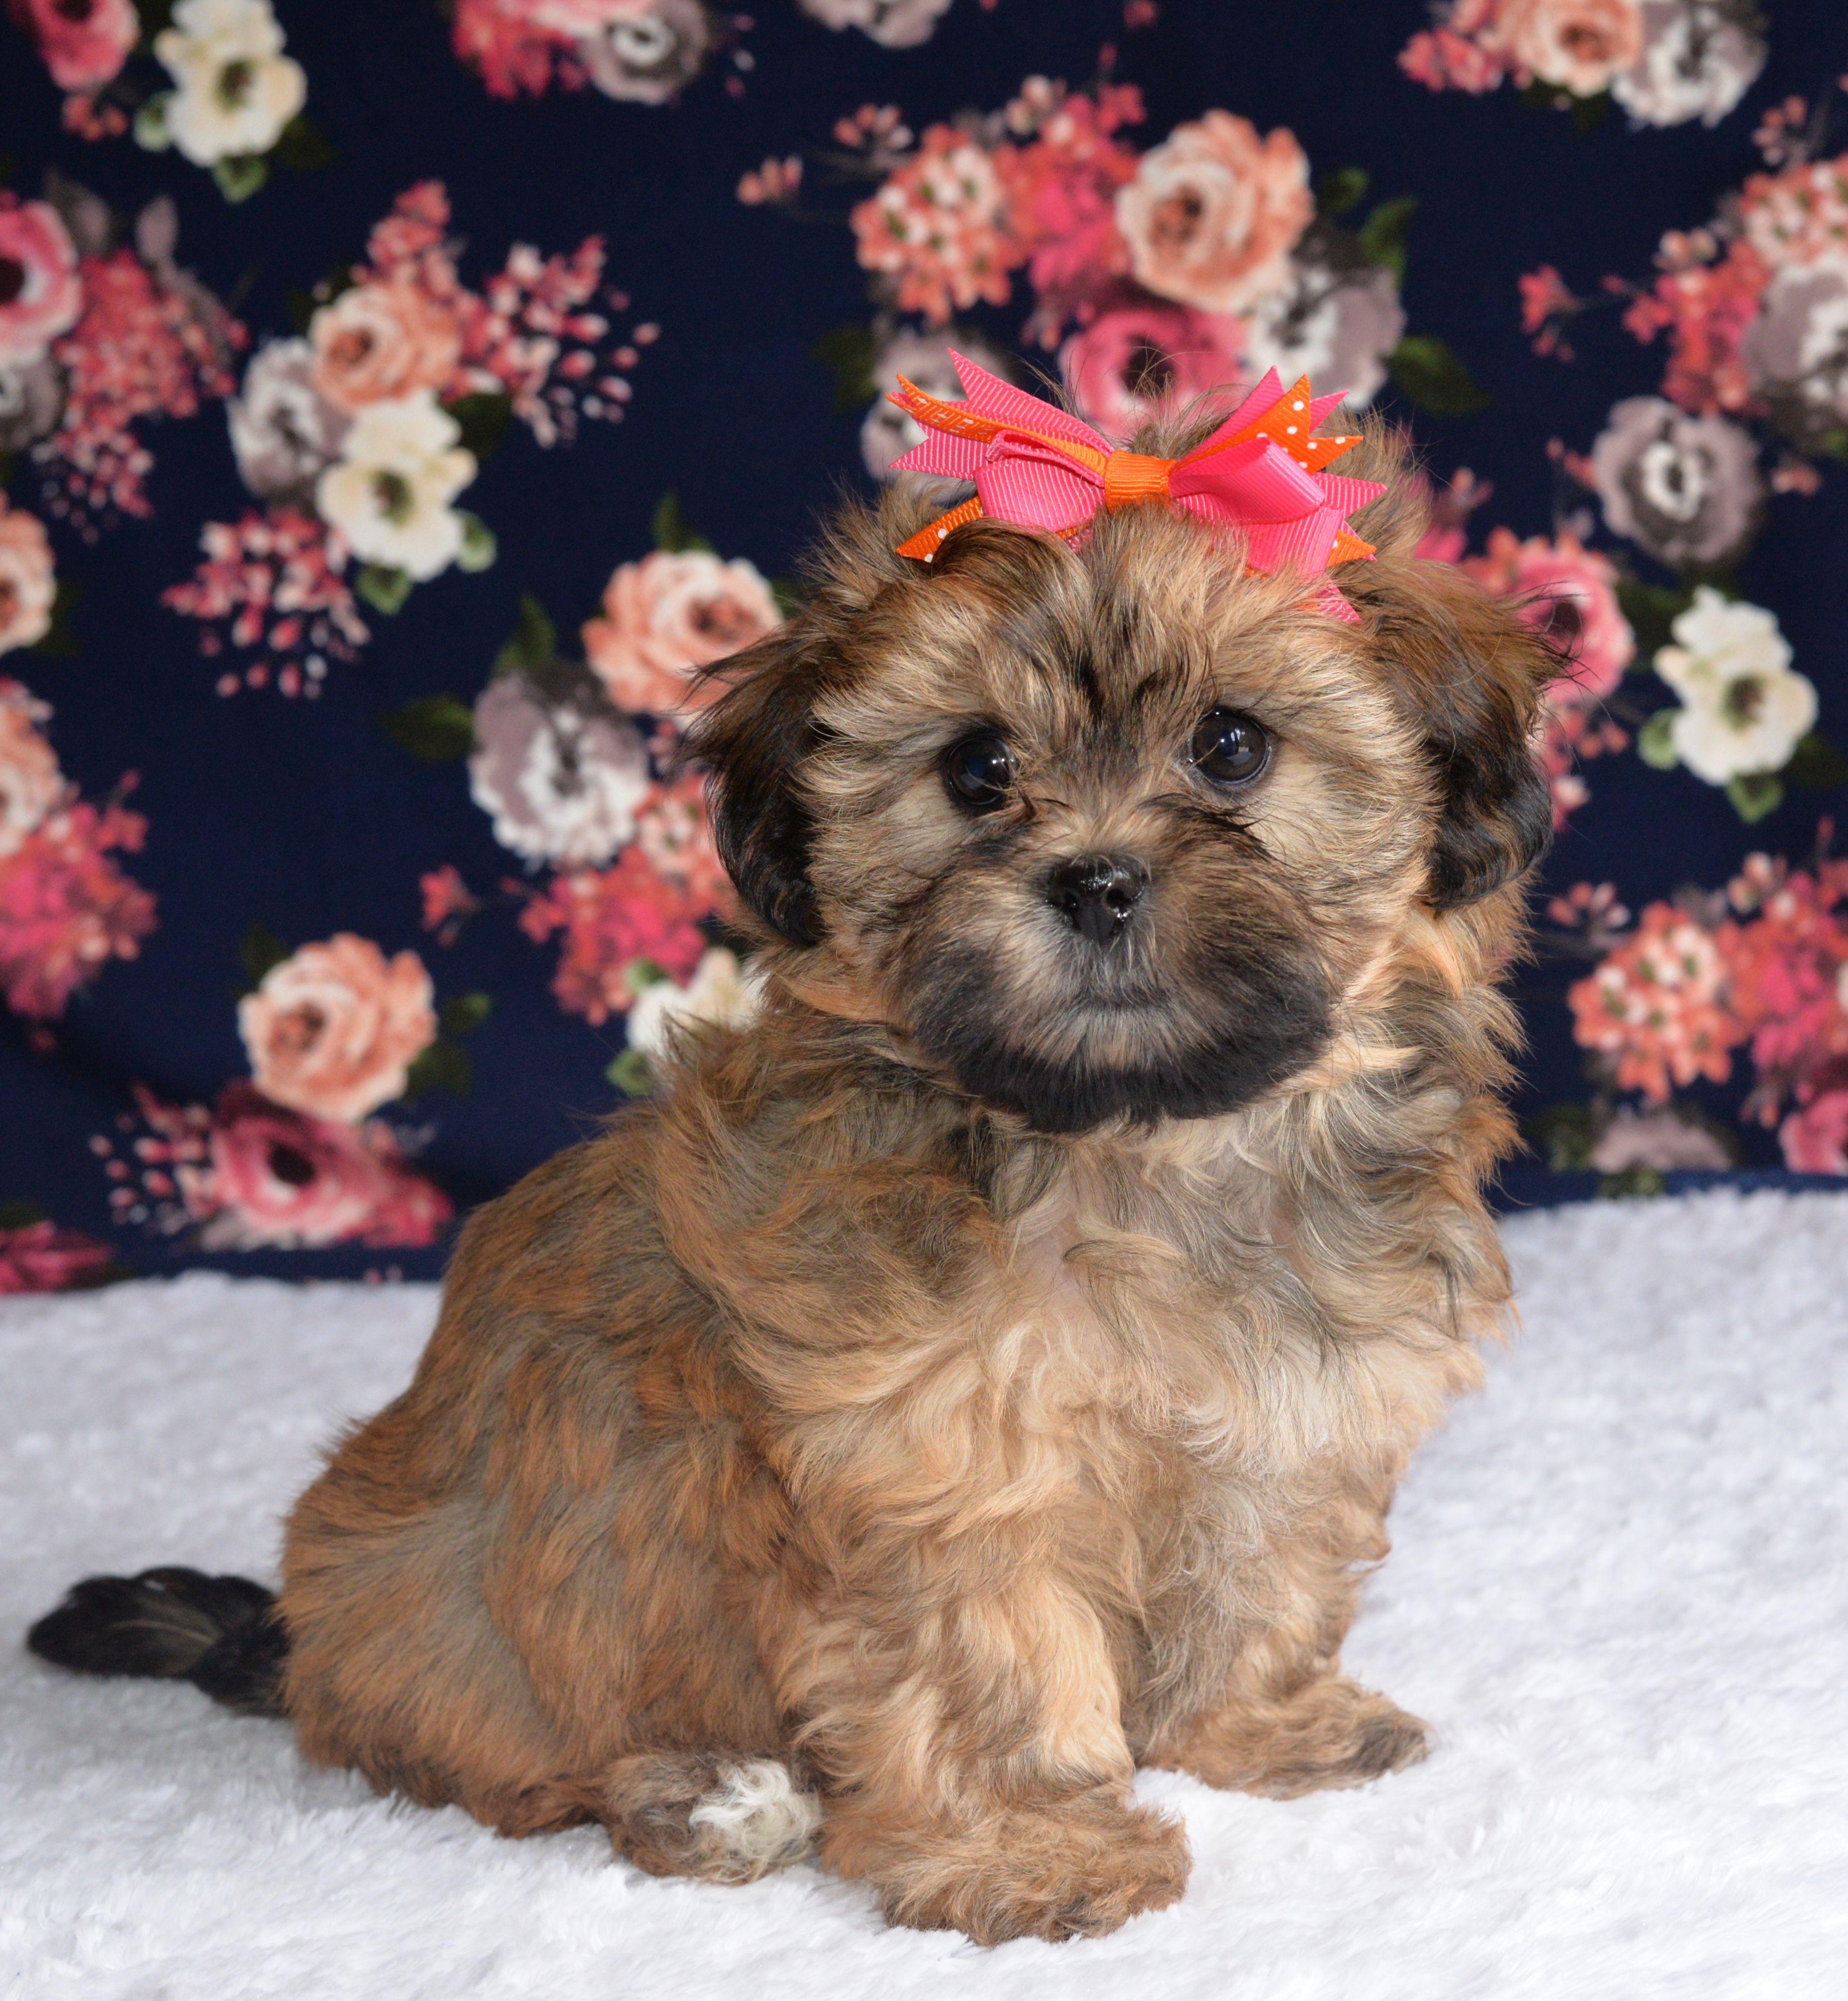 Wonderful Shihpoo Shih Poo Puppies Shih Poo Cute Animals